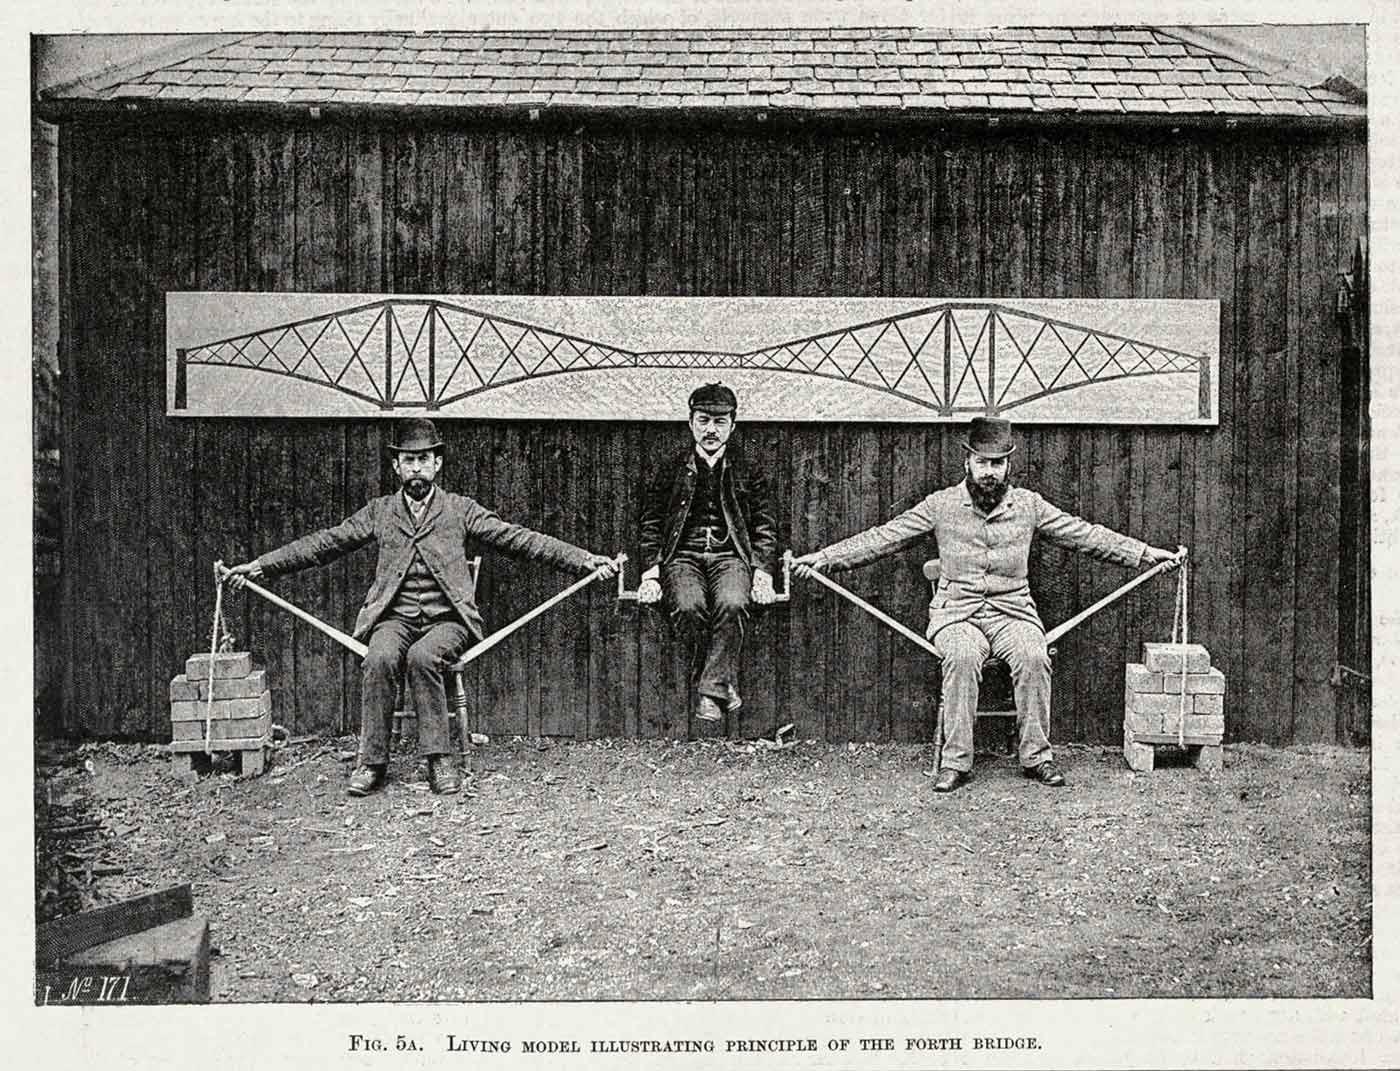 Postcard of Benjamin Baker's human cantilever bridge model.